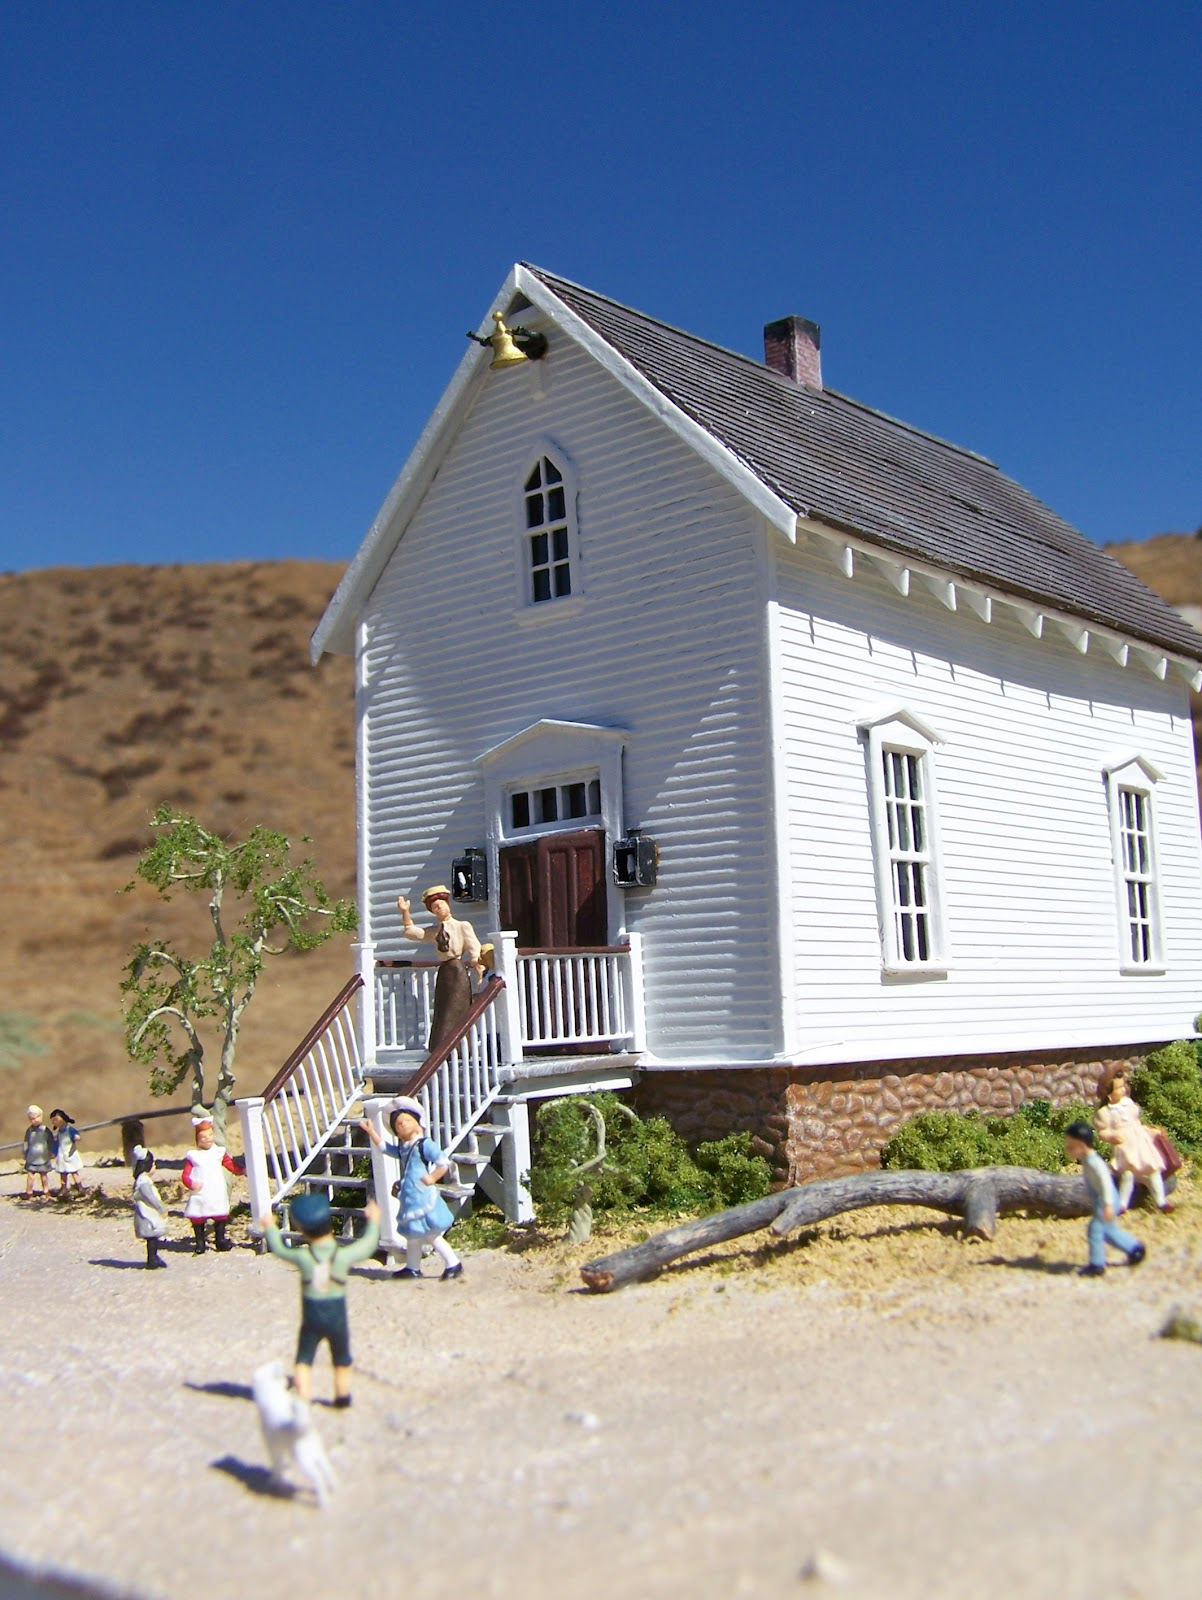 WALNUT GROVE SCHOOL HOUSE MODEL from Little House on the Prairie TV series